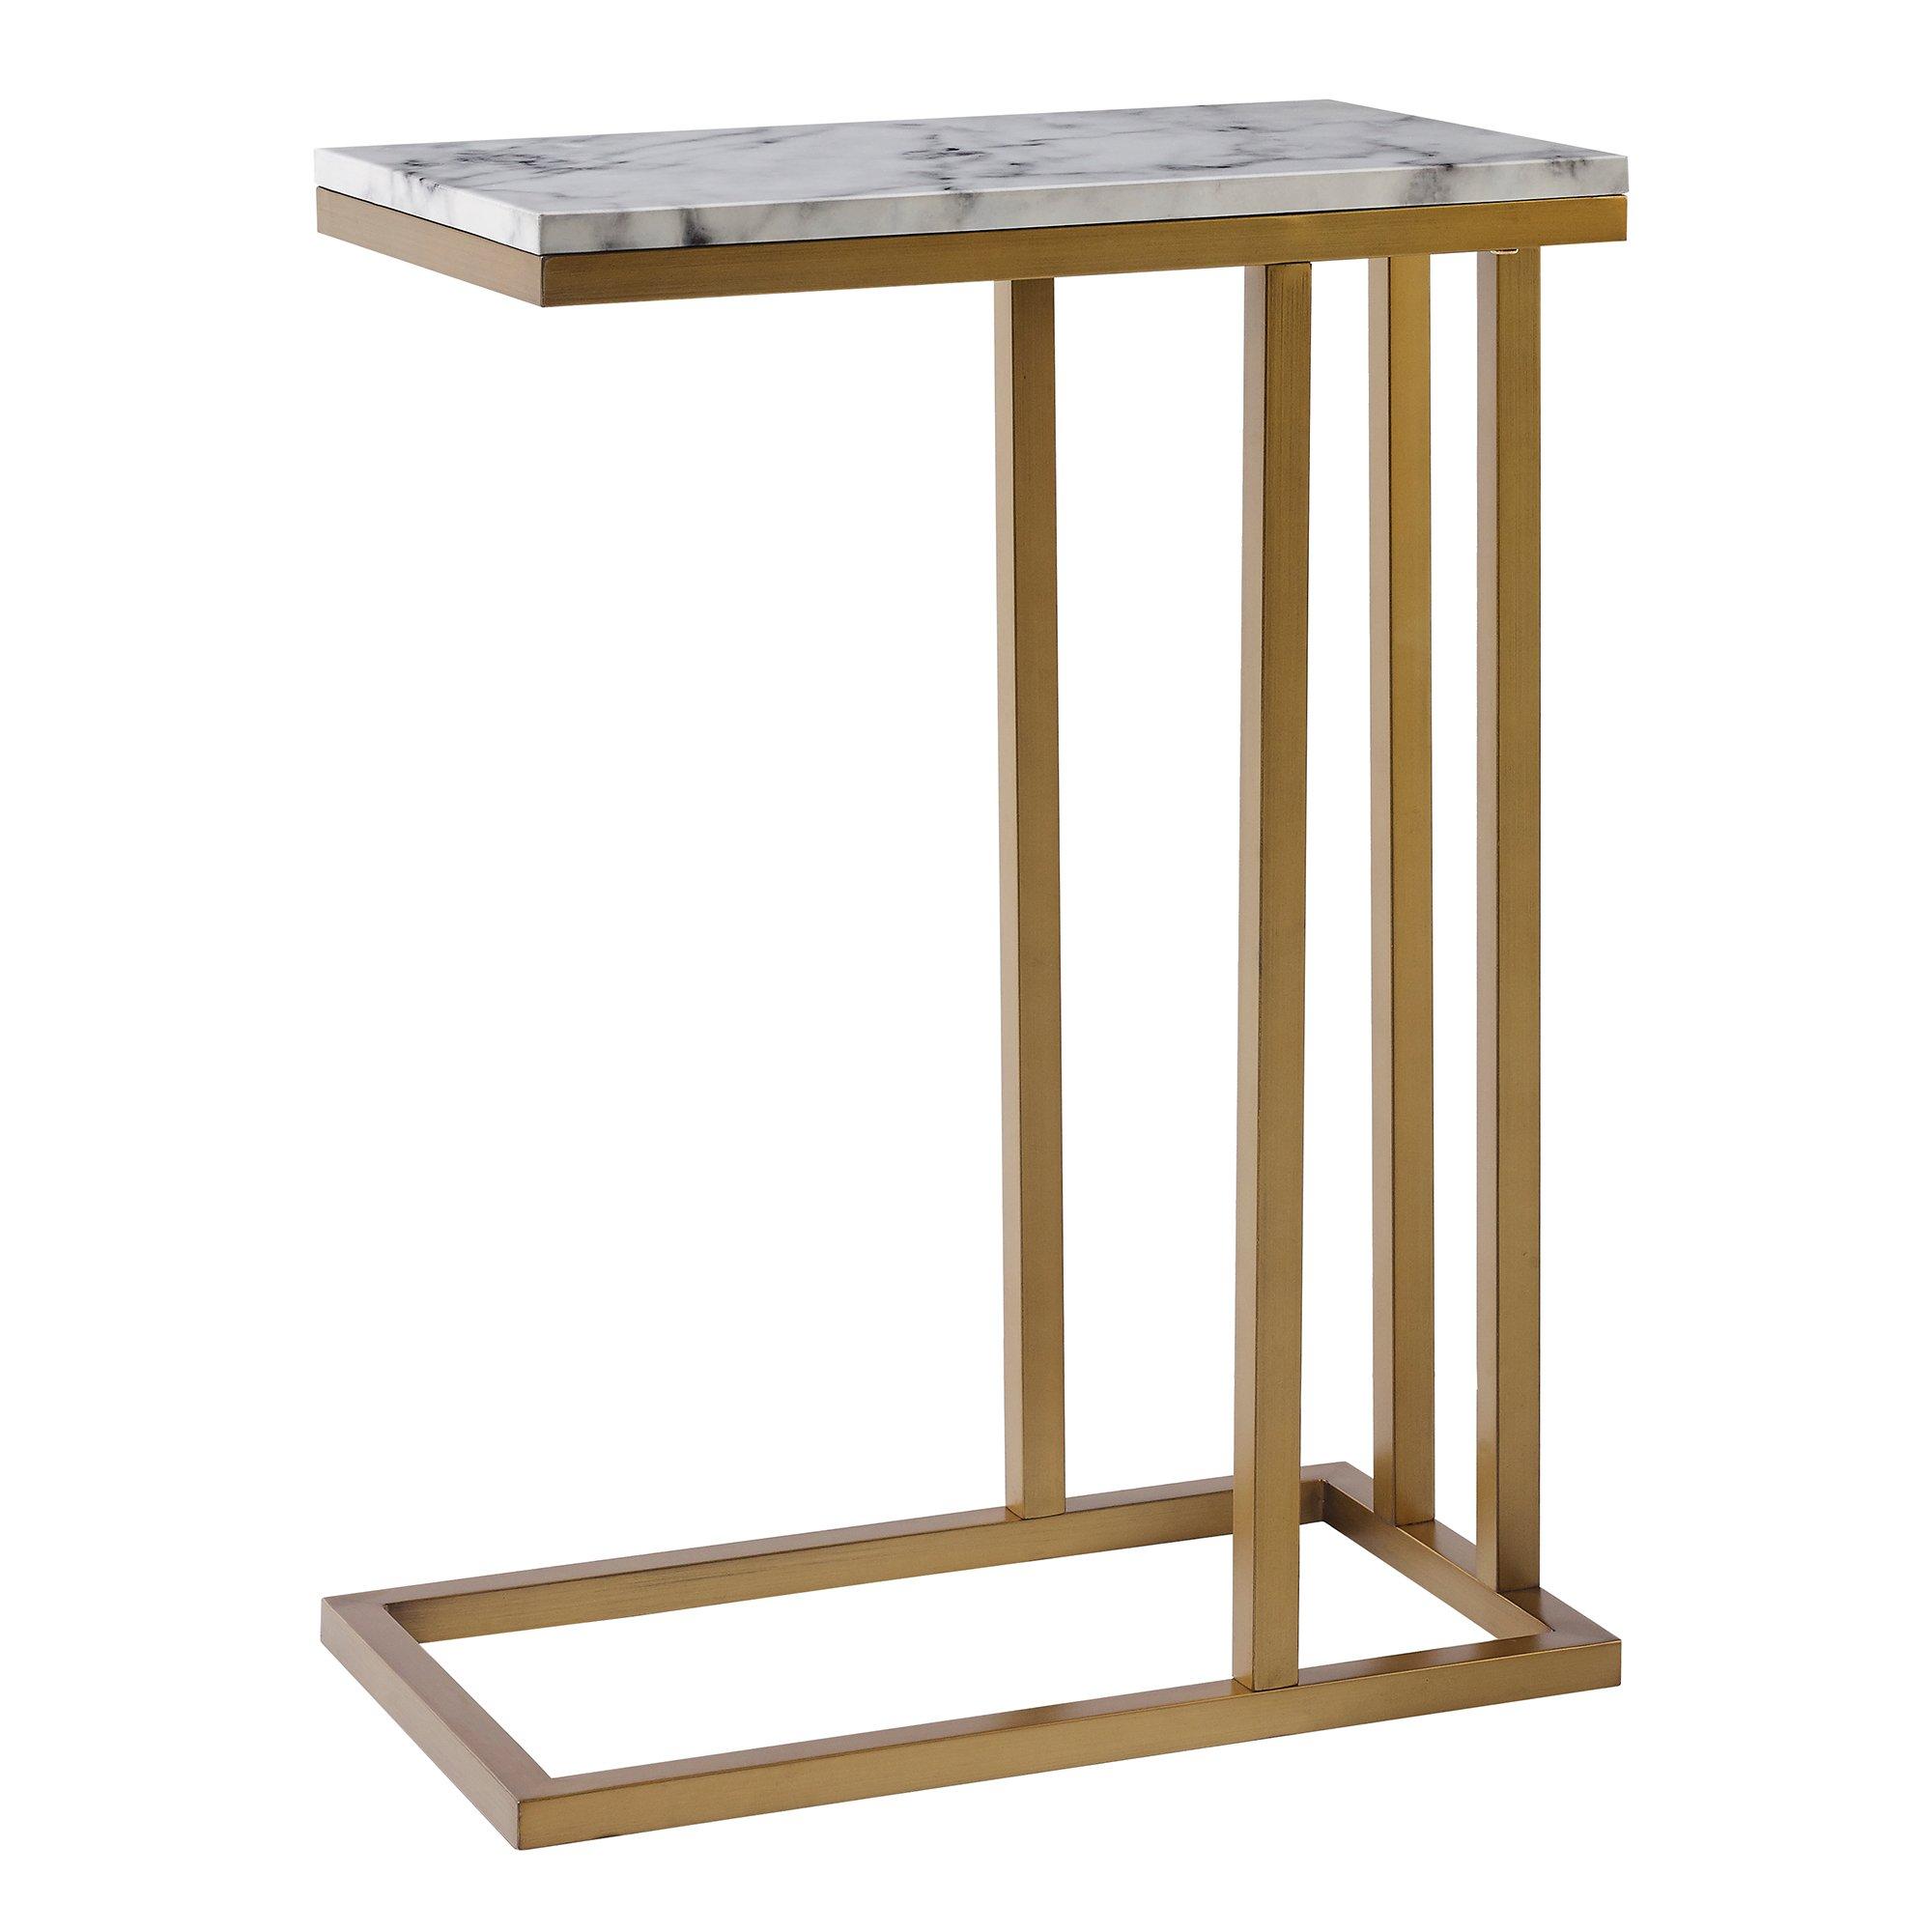 Versanora - Marmo C Shape Table - Faux Marble /Brass by Versanora (Image #2)